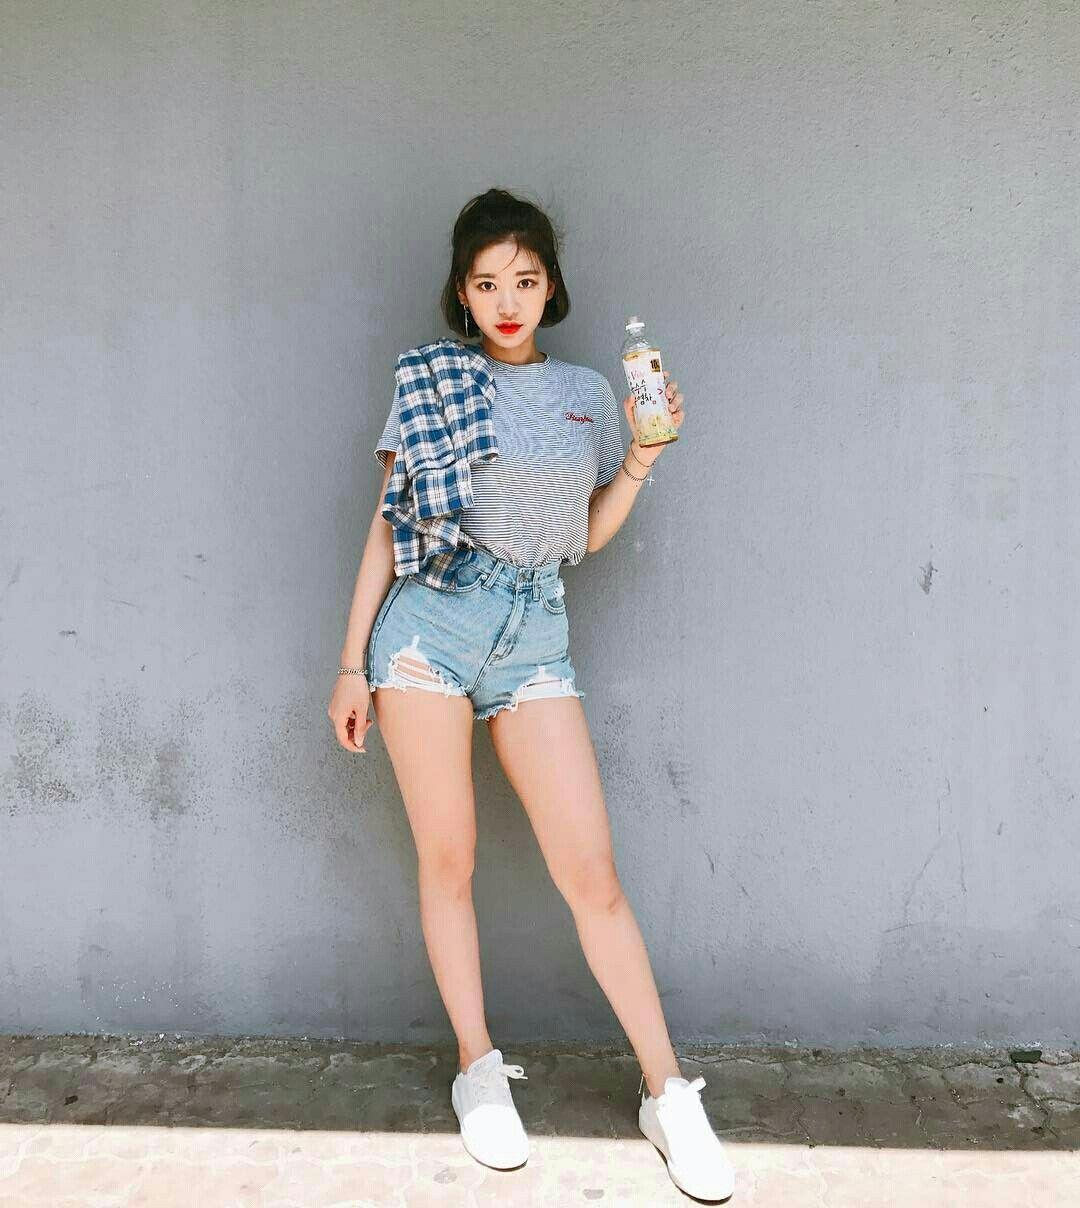 Pin by Lil myze on K fashion1